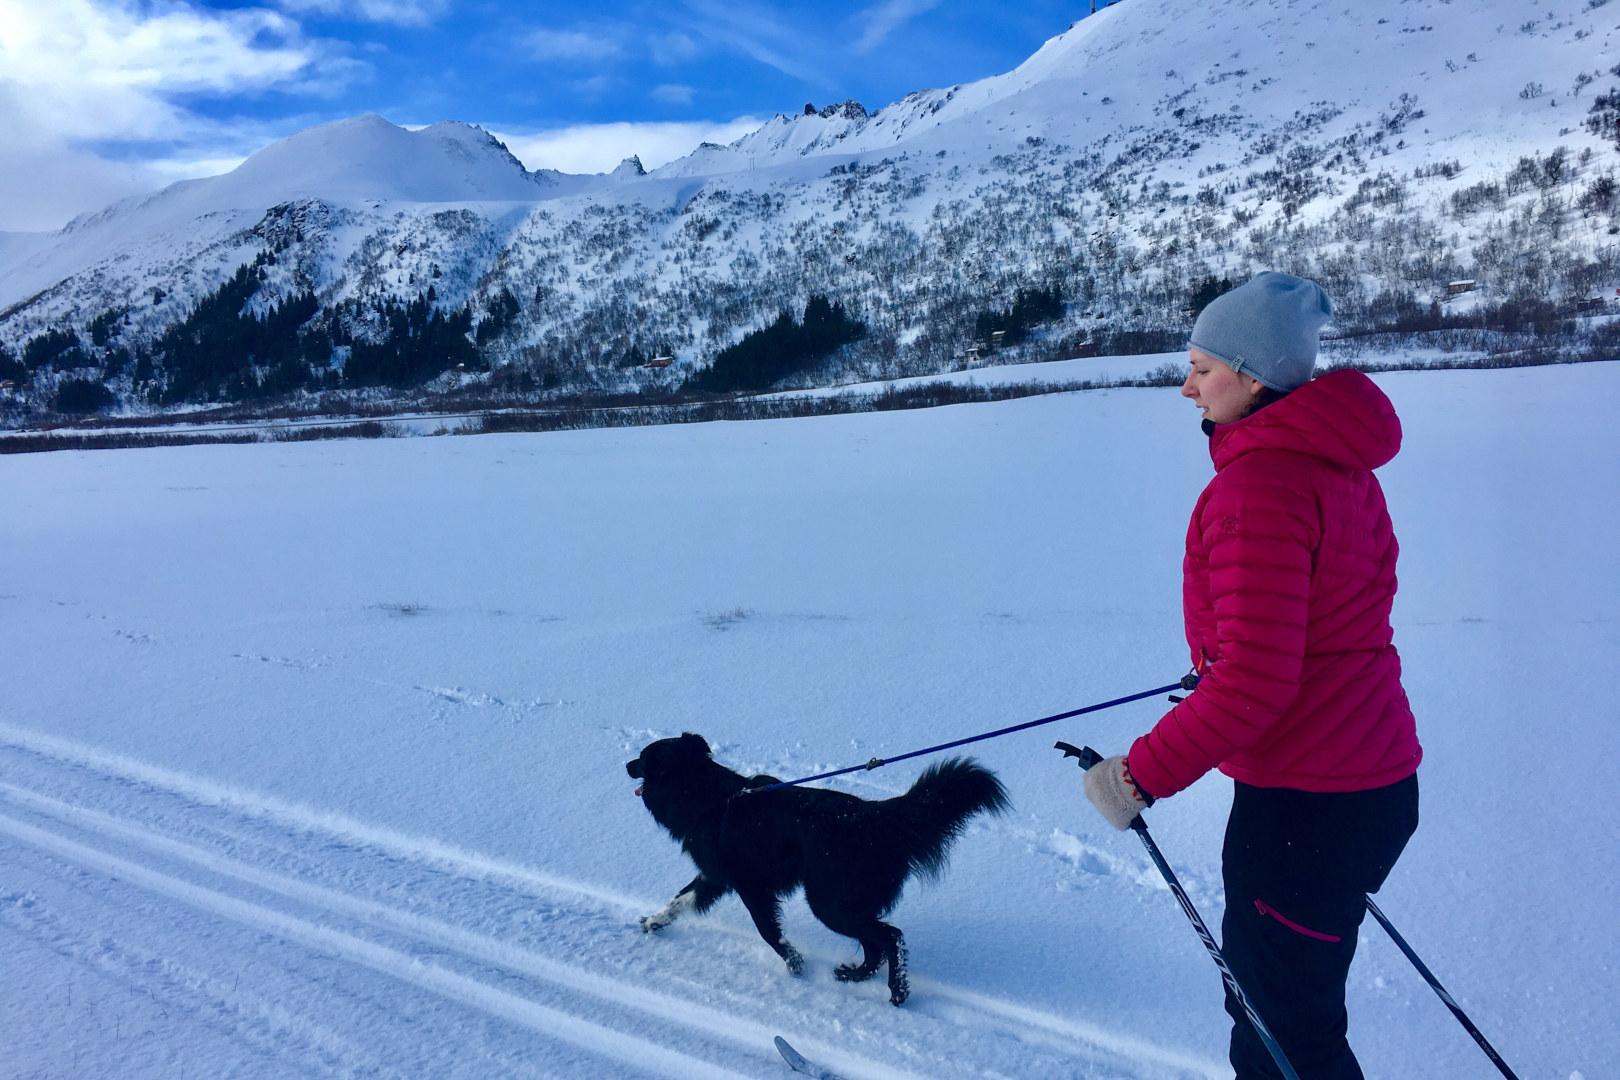 3_AndenesHotell_2_skiing_Alf Ragnar Olsen